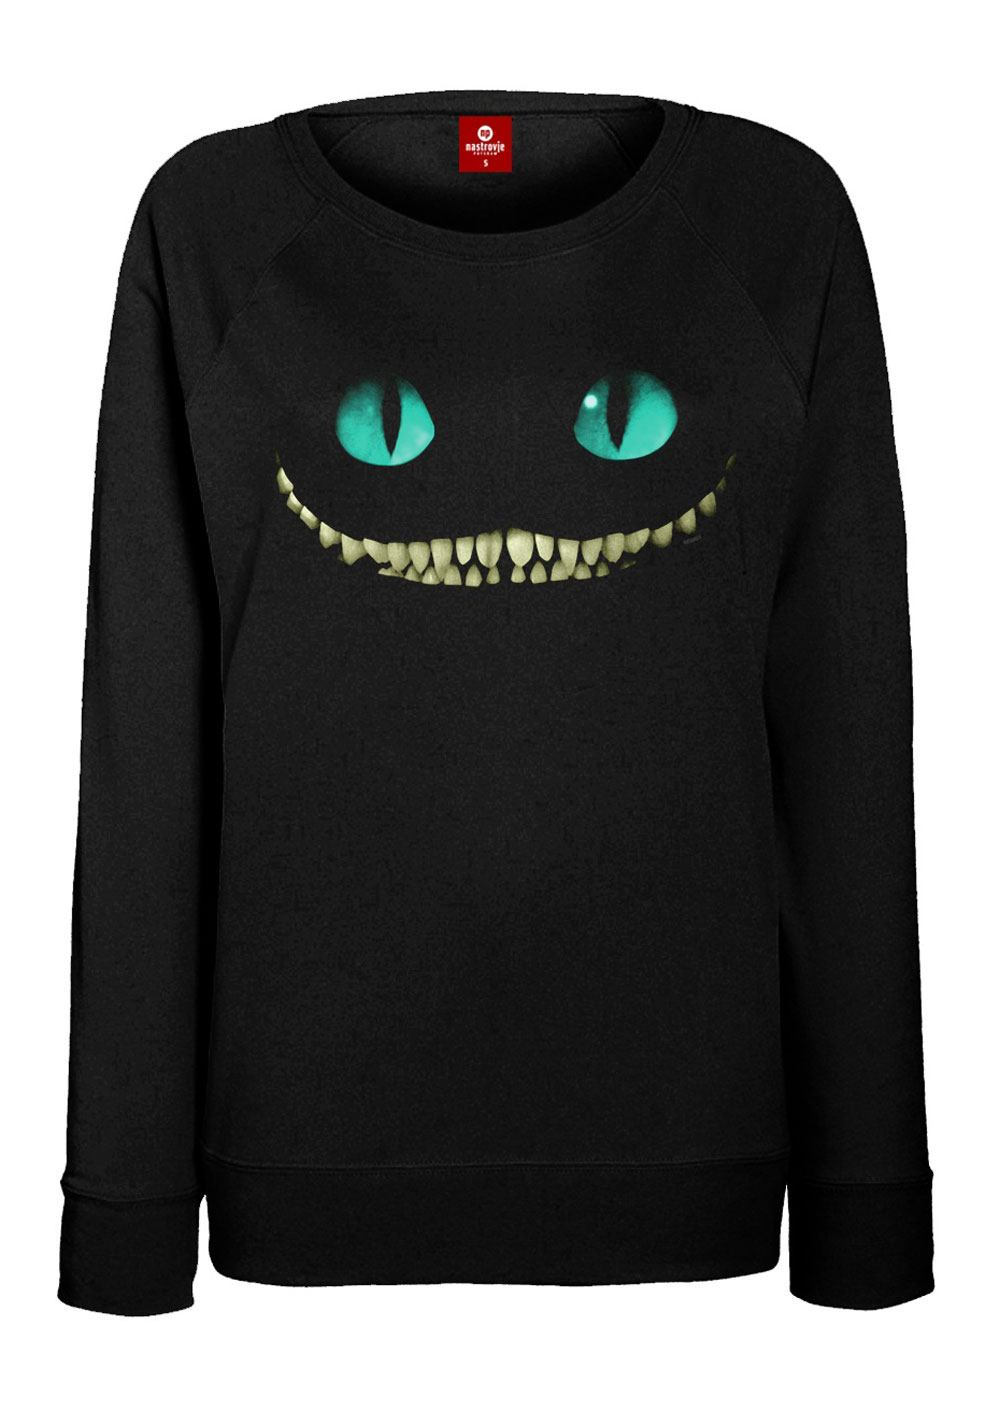 Alice in Wonderland Ladies Sweater Smile Size S